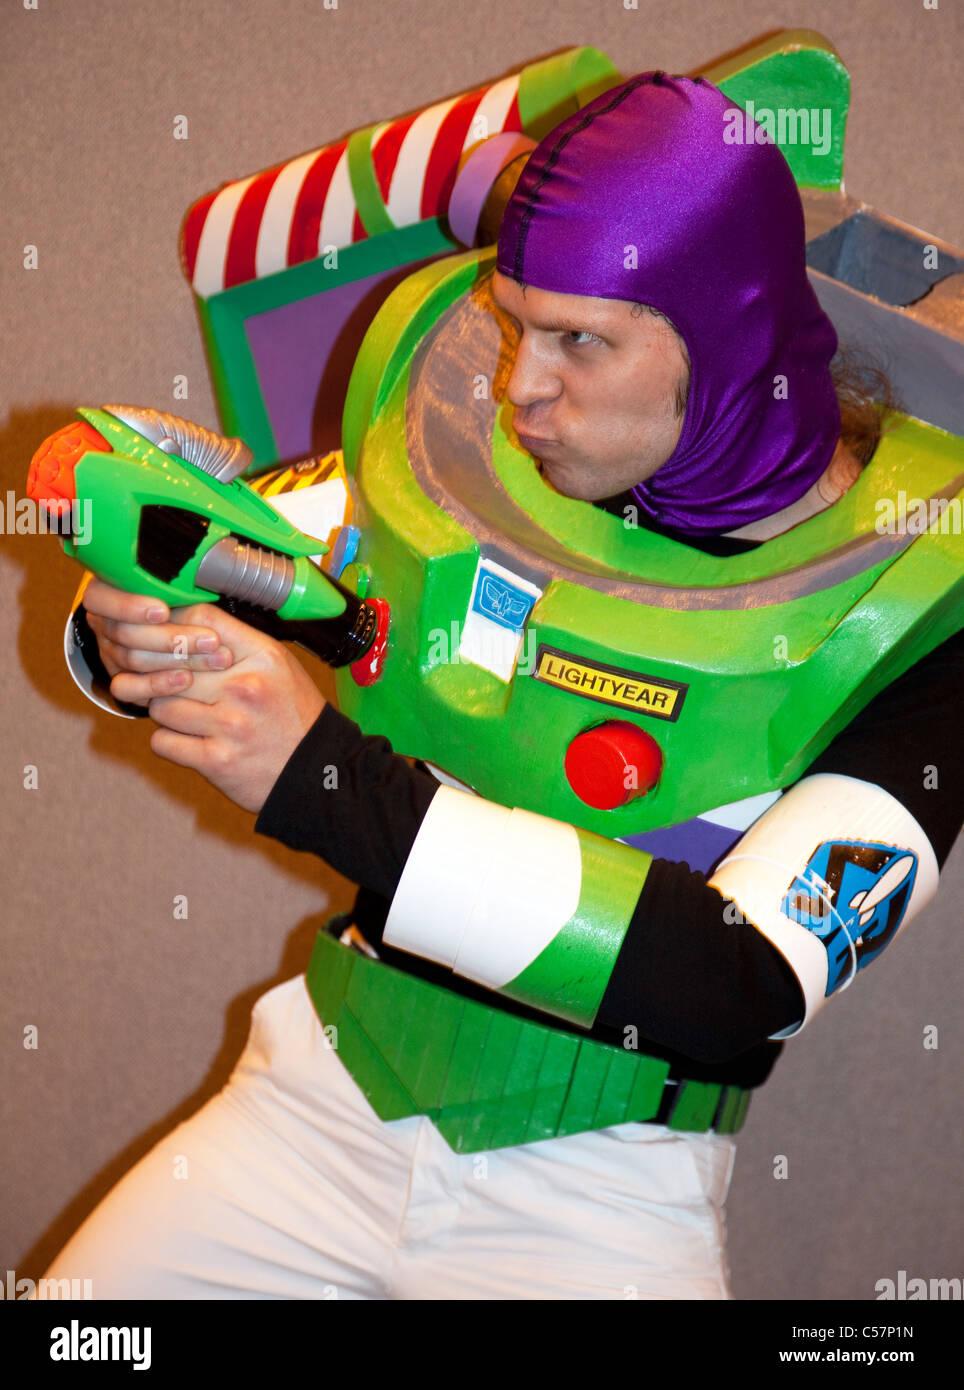 London Film & Comic Con 2011: Buzz Lightyear character - Stock Image